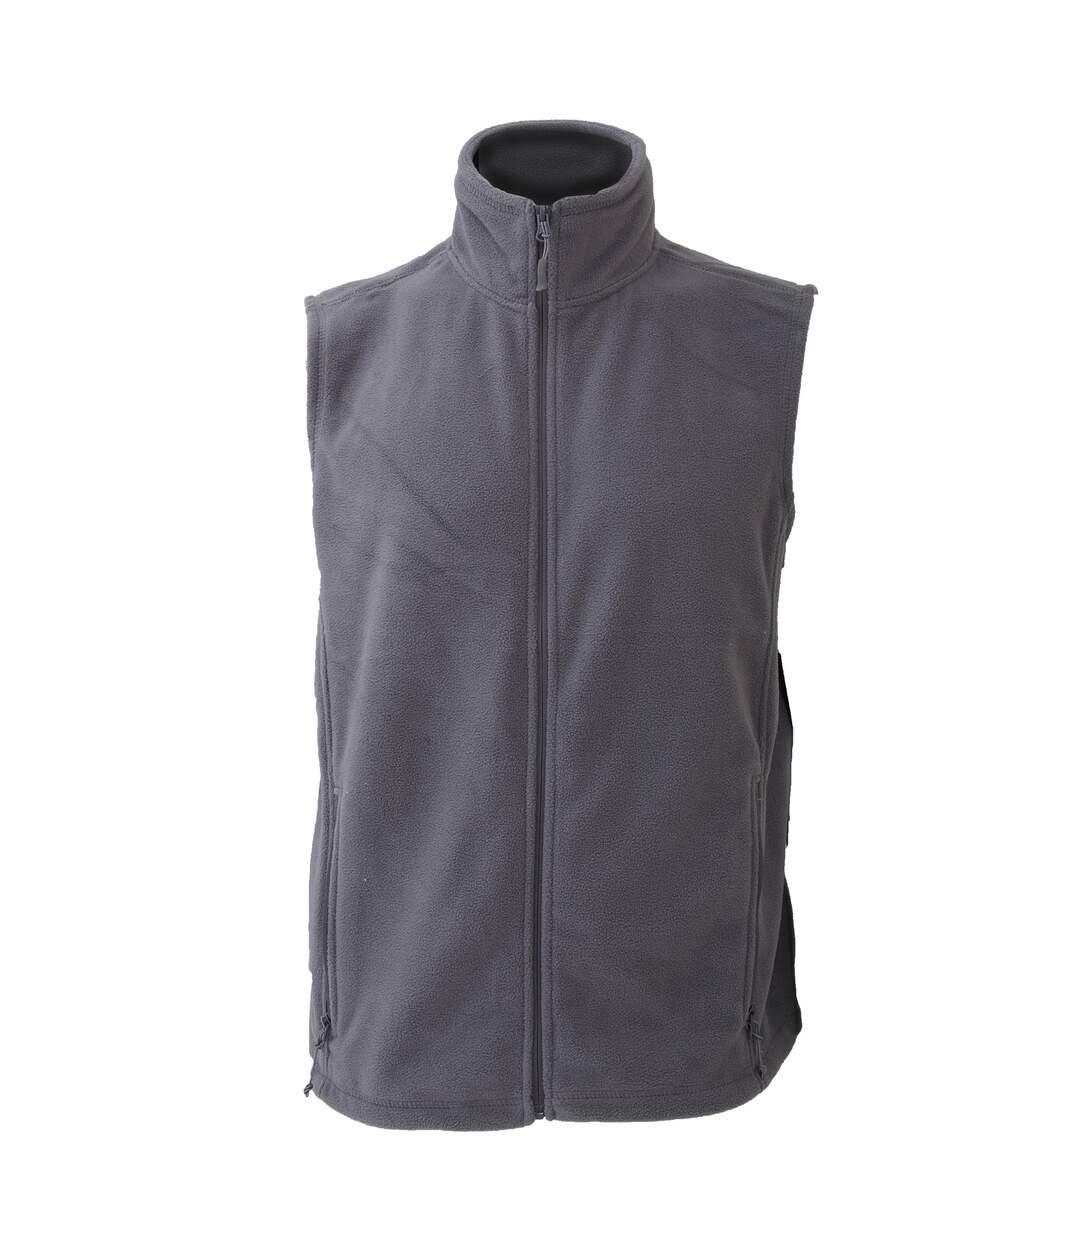 Jerzees Colour Fleece Gilet Jacket / Bodywarmer (Burgundy) - UTBC576